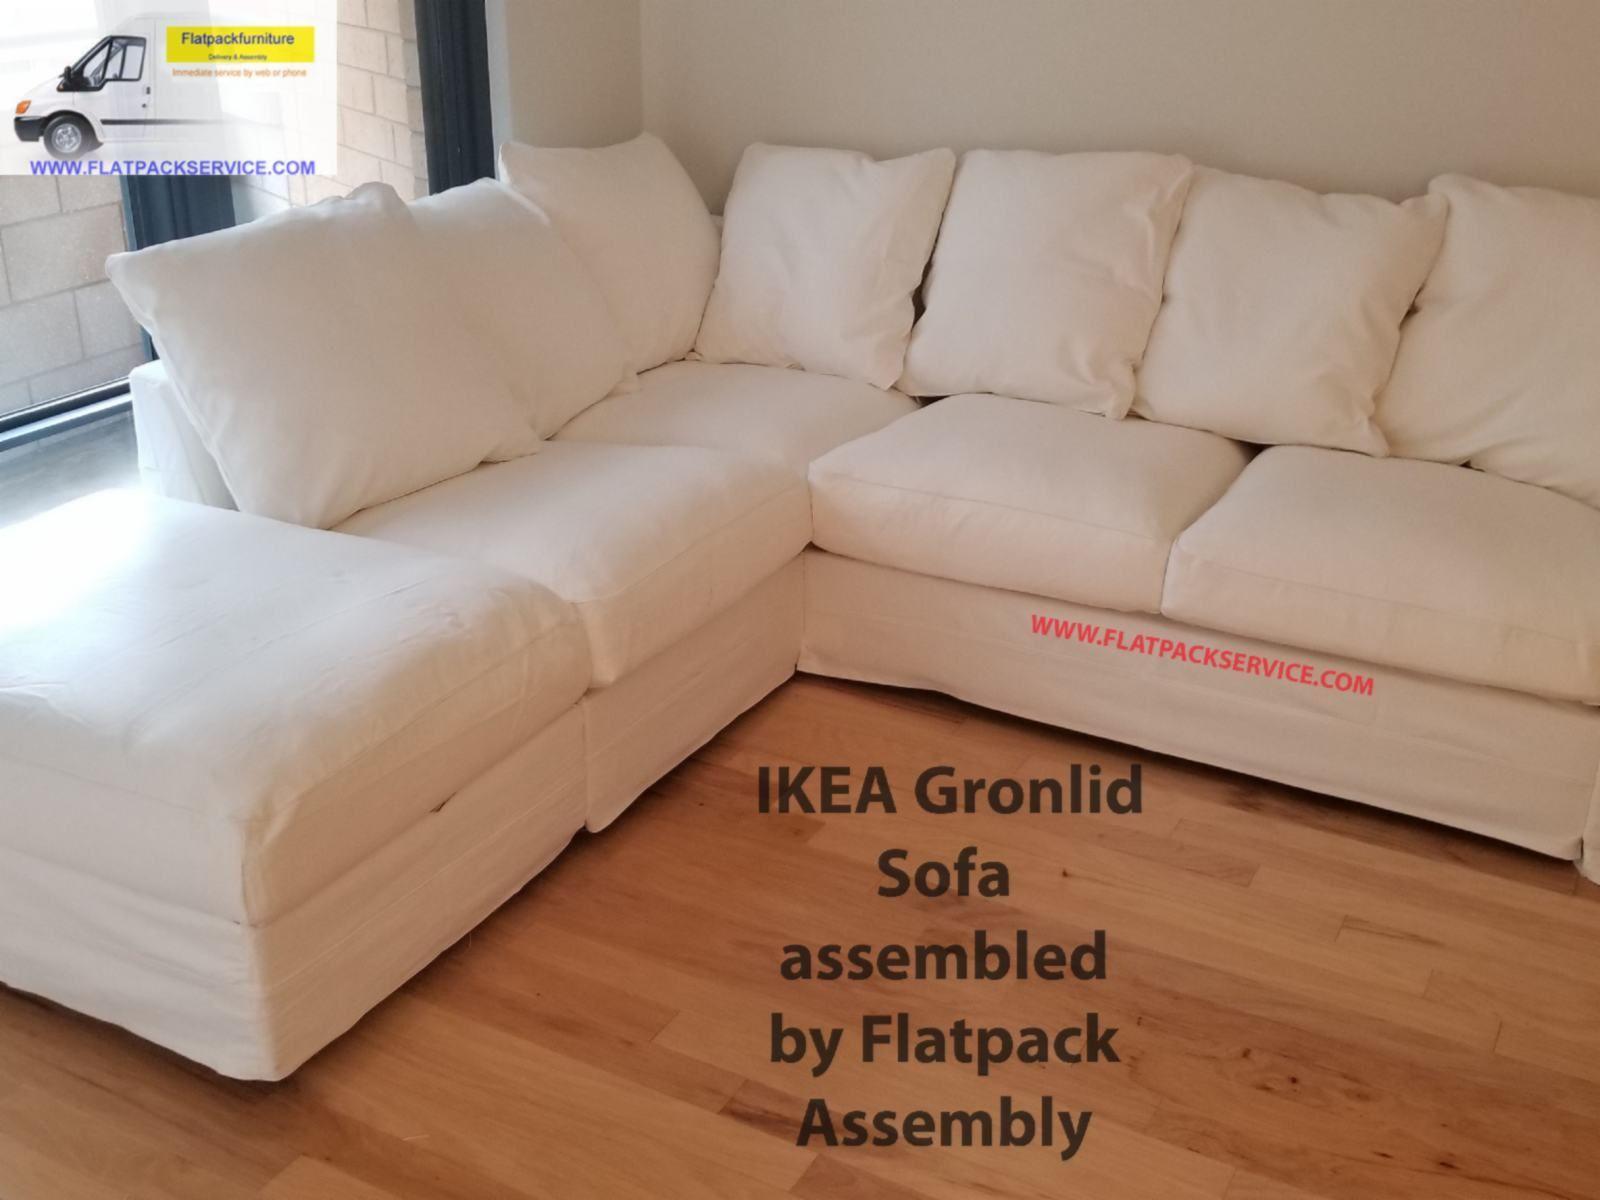 Ikea Gronlid Sofa Artikelnummer 992 546 82 Beste Ikea Versammlung